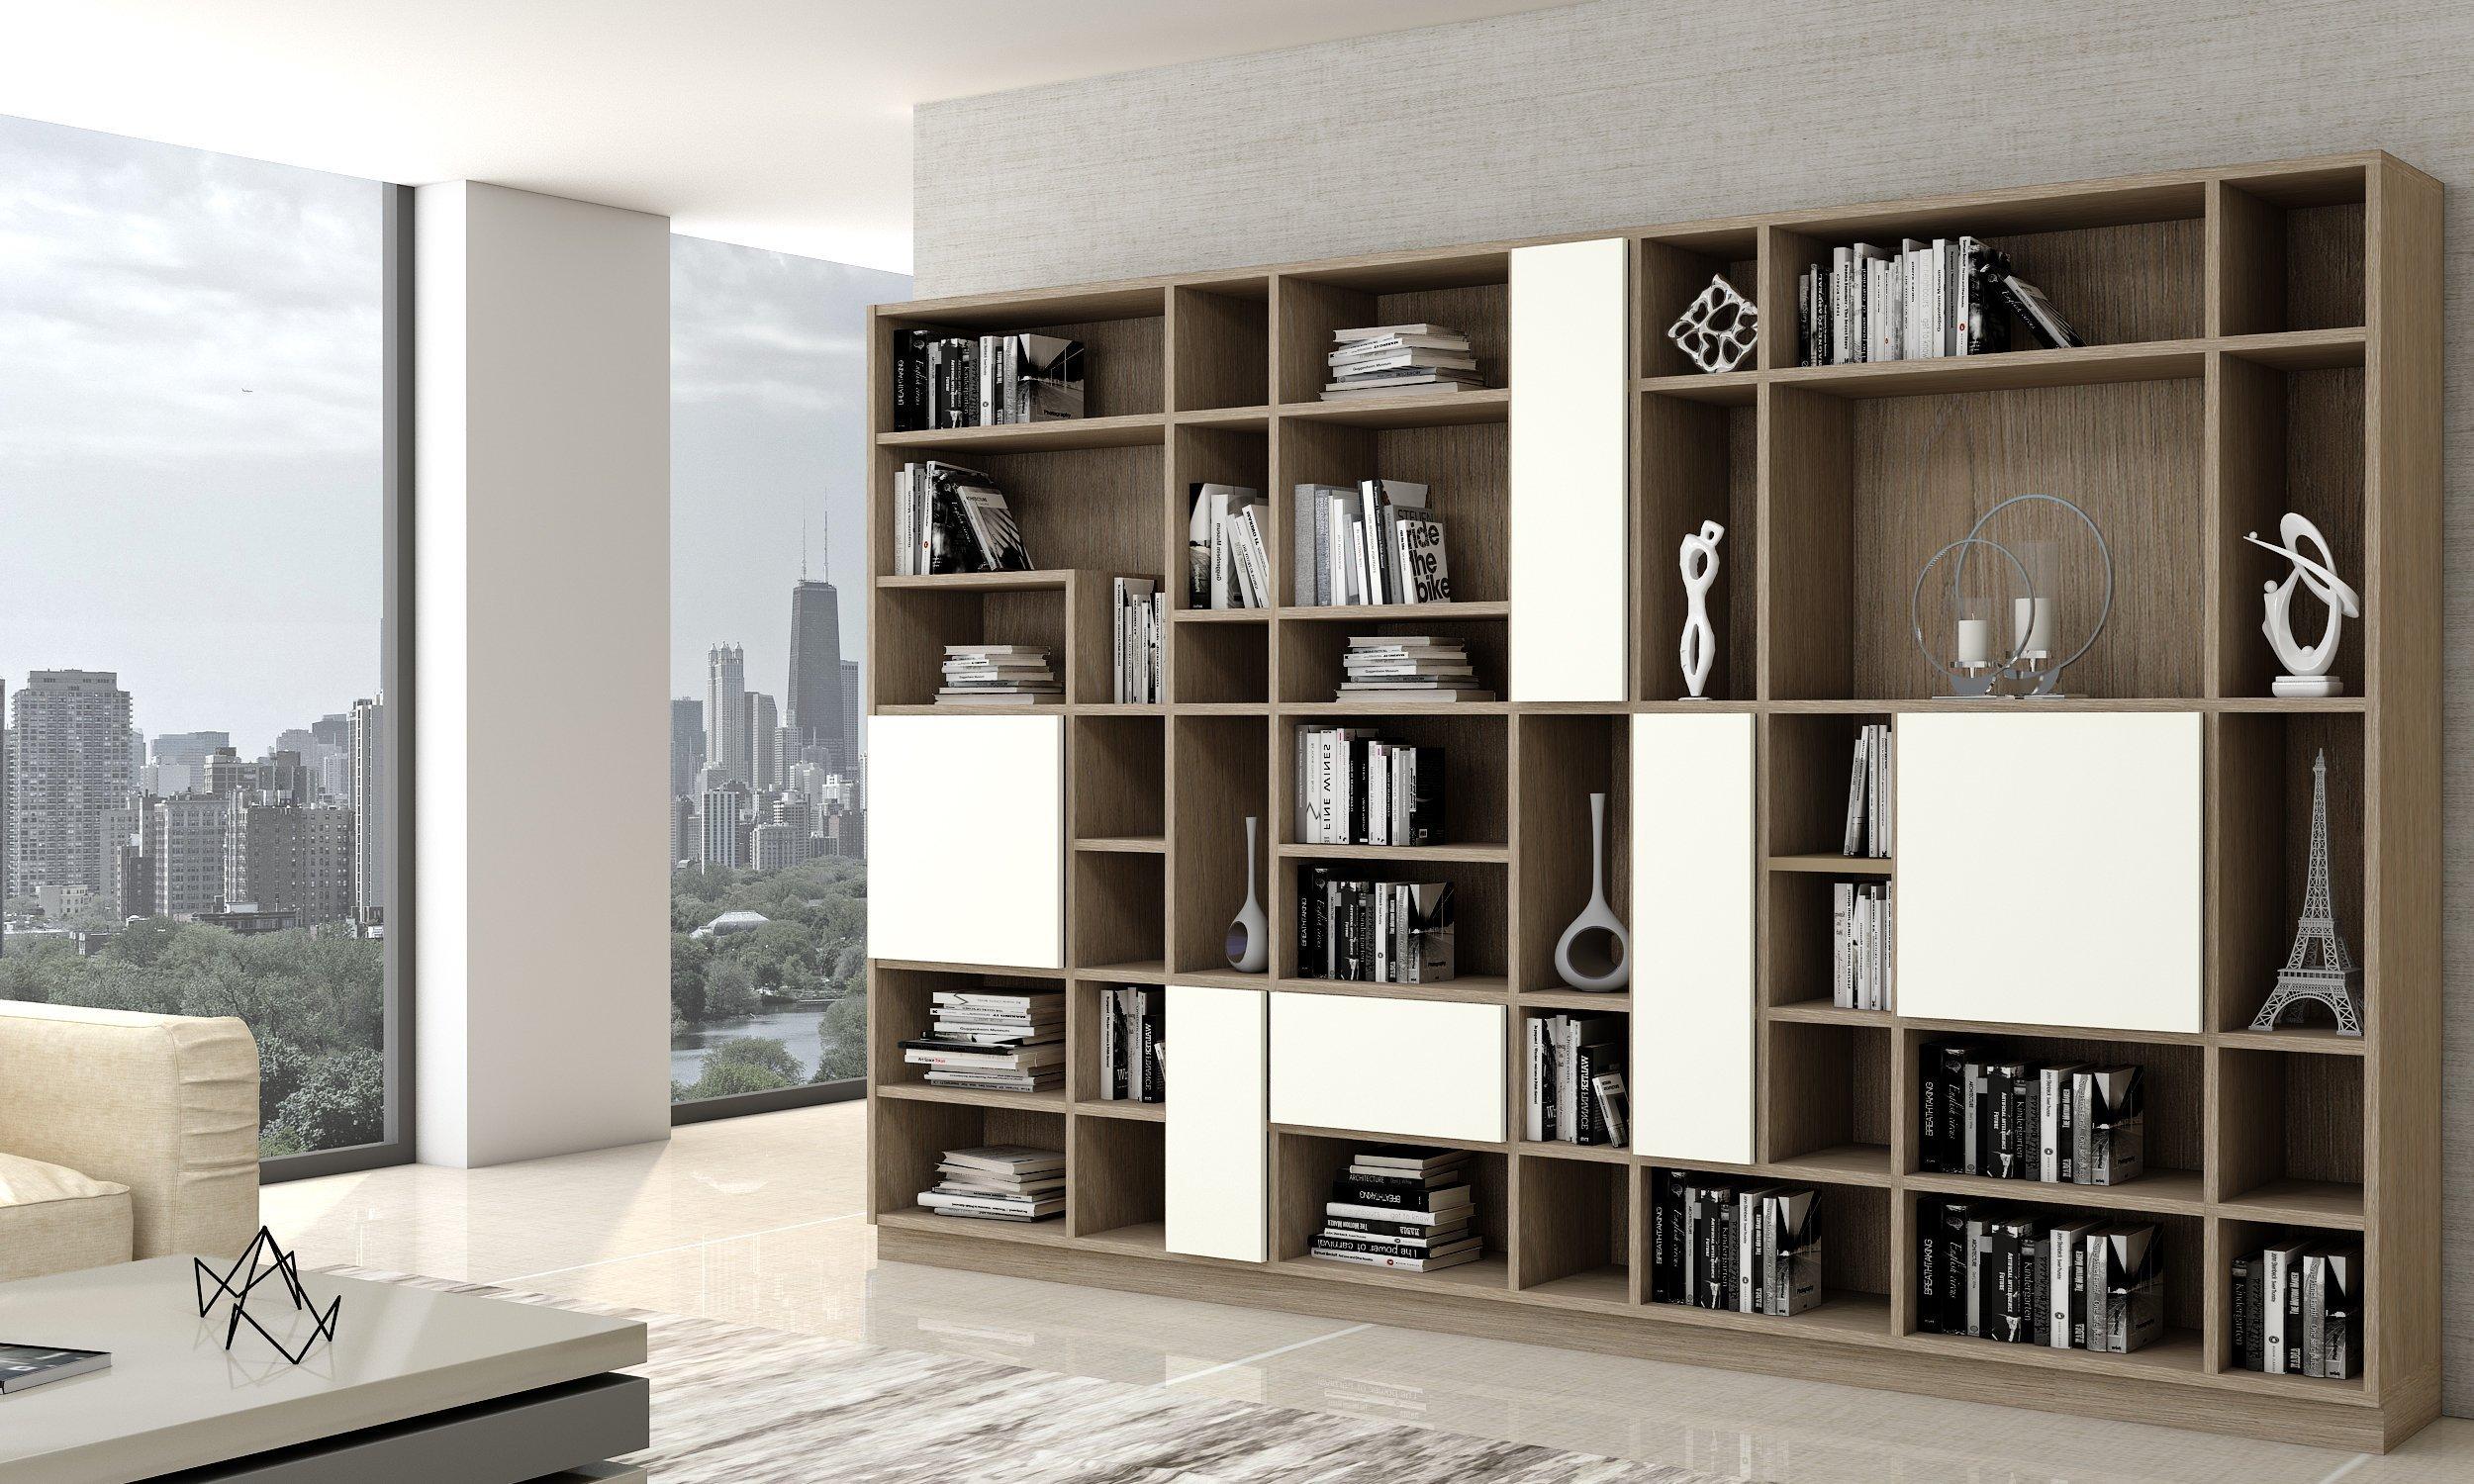 Library bookshelf living room cabinet with Woodgrain finish (1)